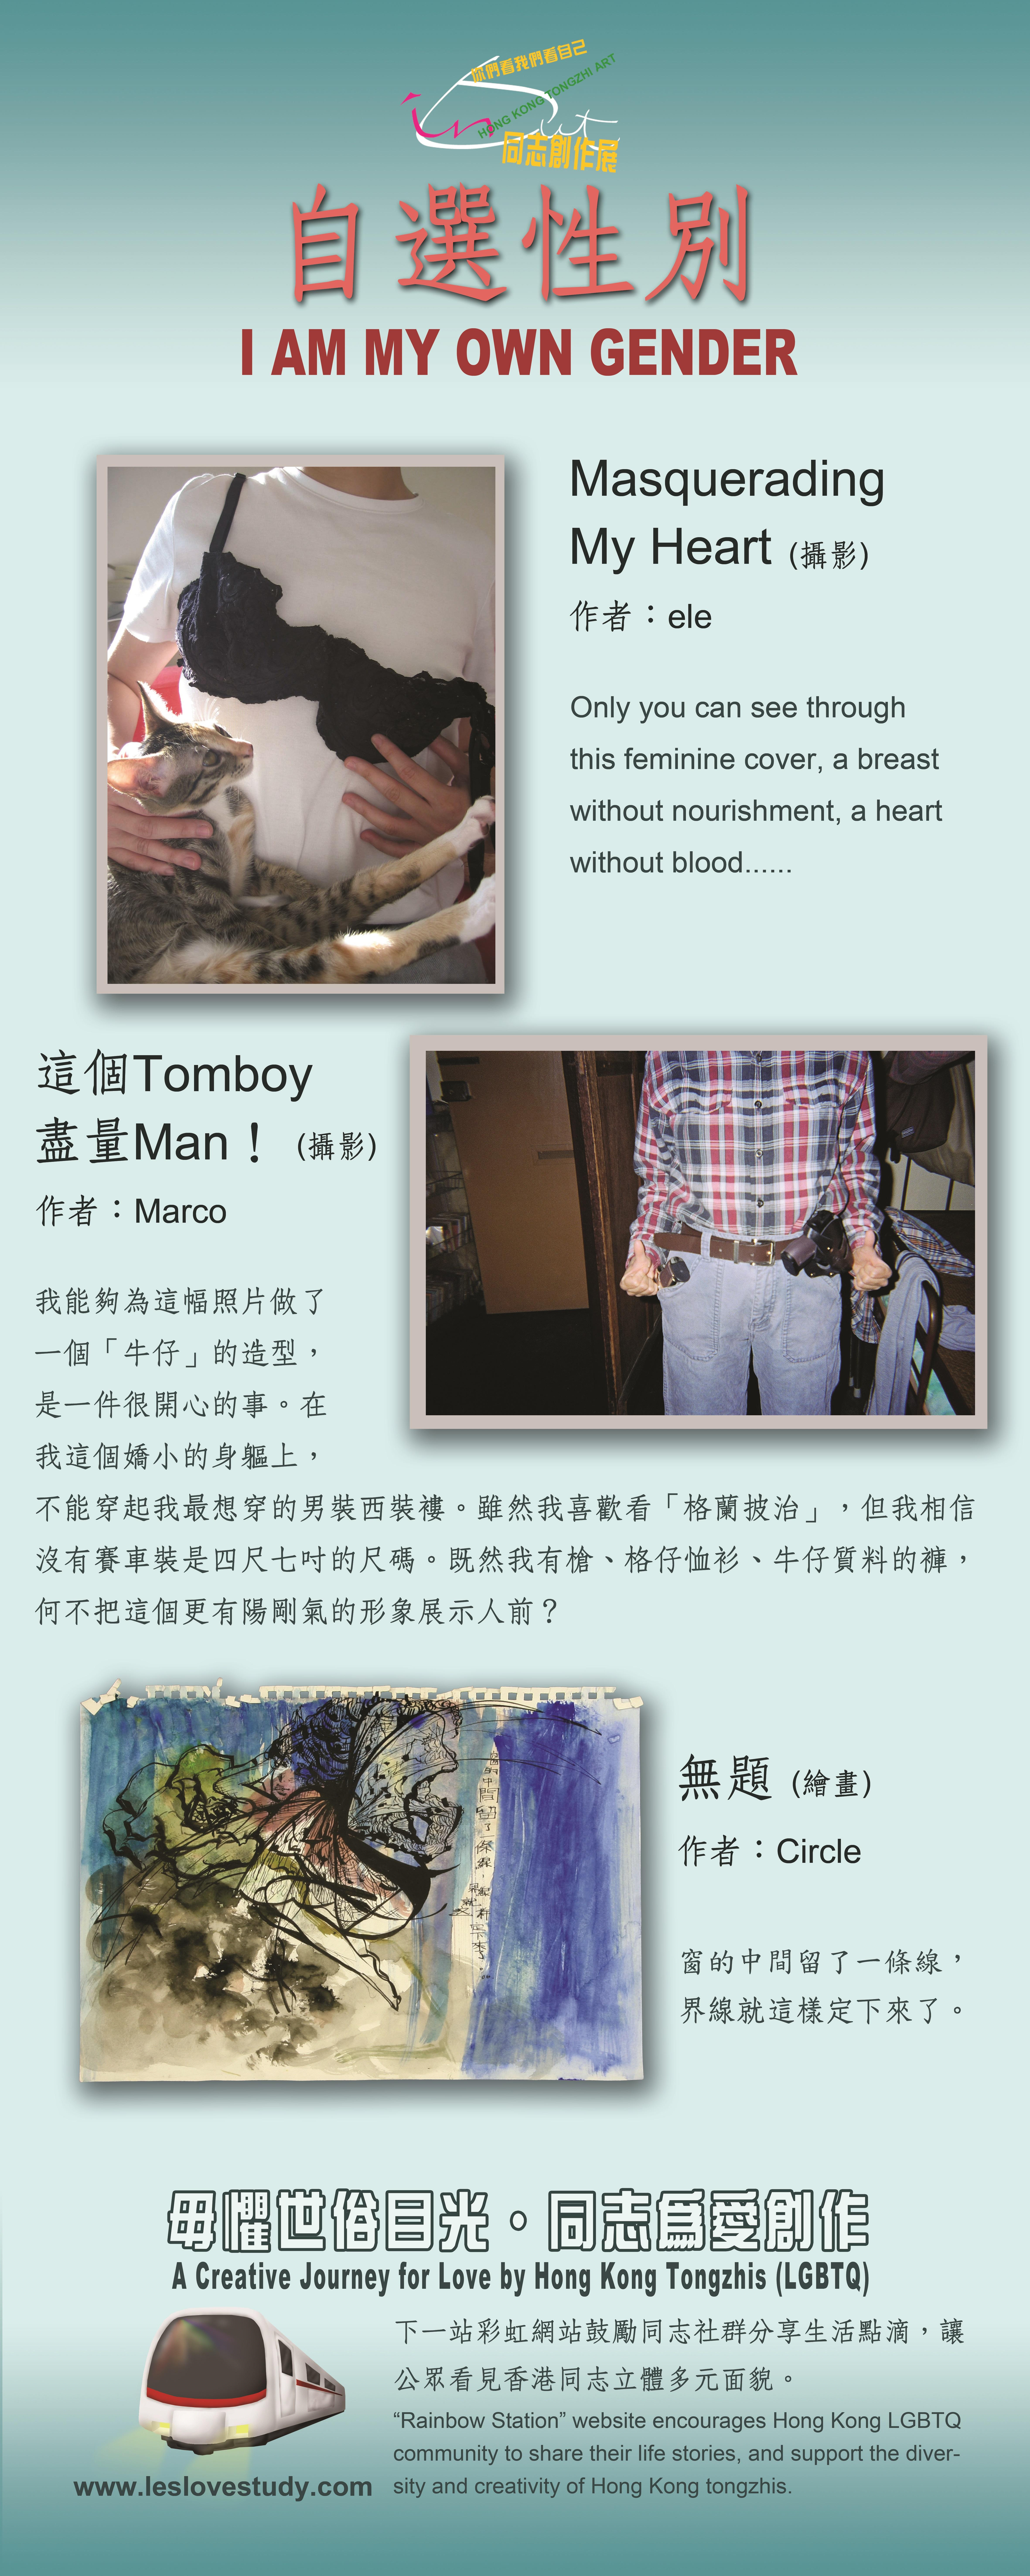 "Exhibit panel 1 for ""In/Out: 1st Hong Kong Tongzhi Art Exhibition"", Nutong Xueshe, Hong Kong Cultural Center, 2007"